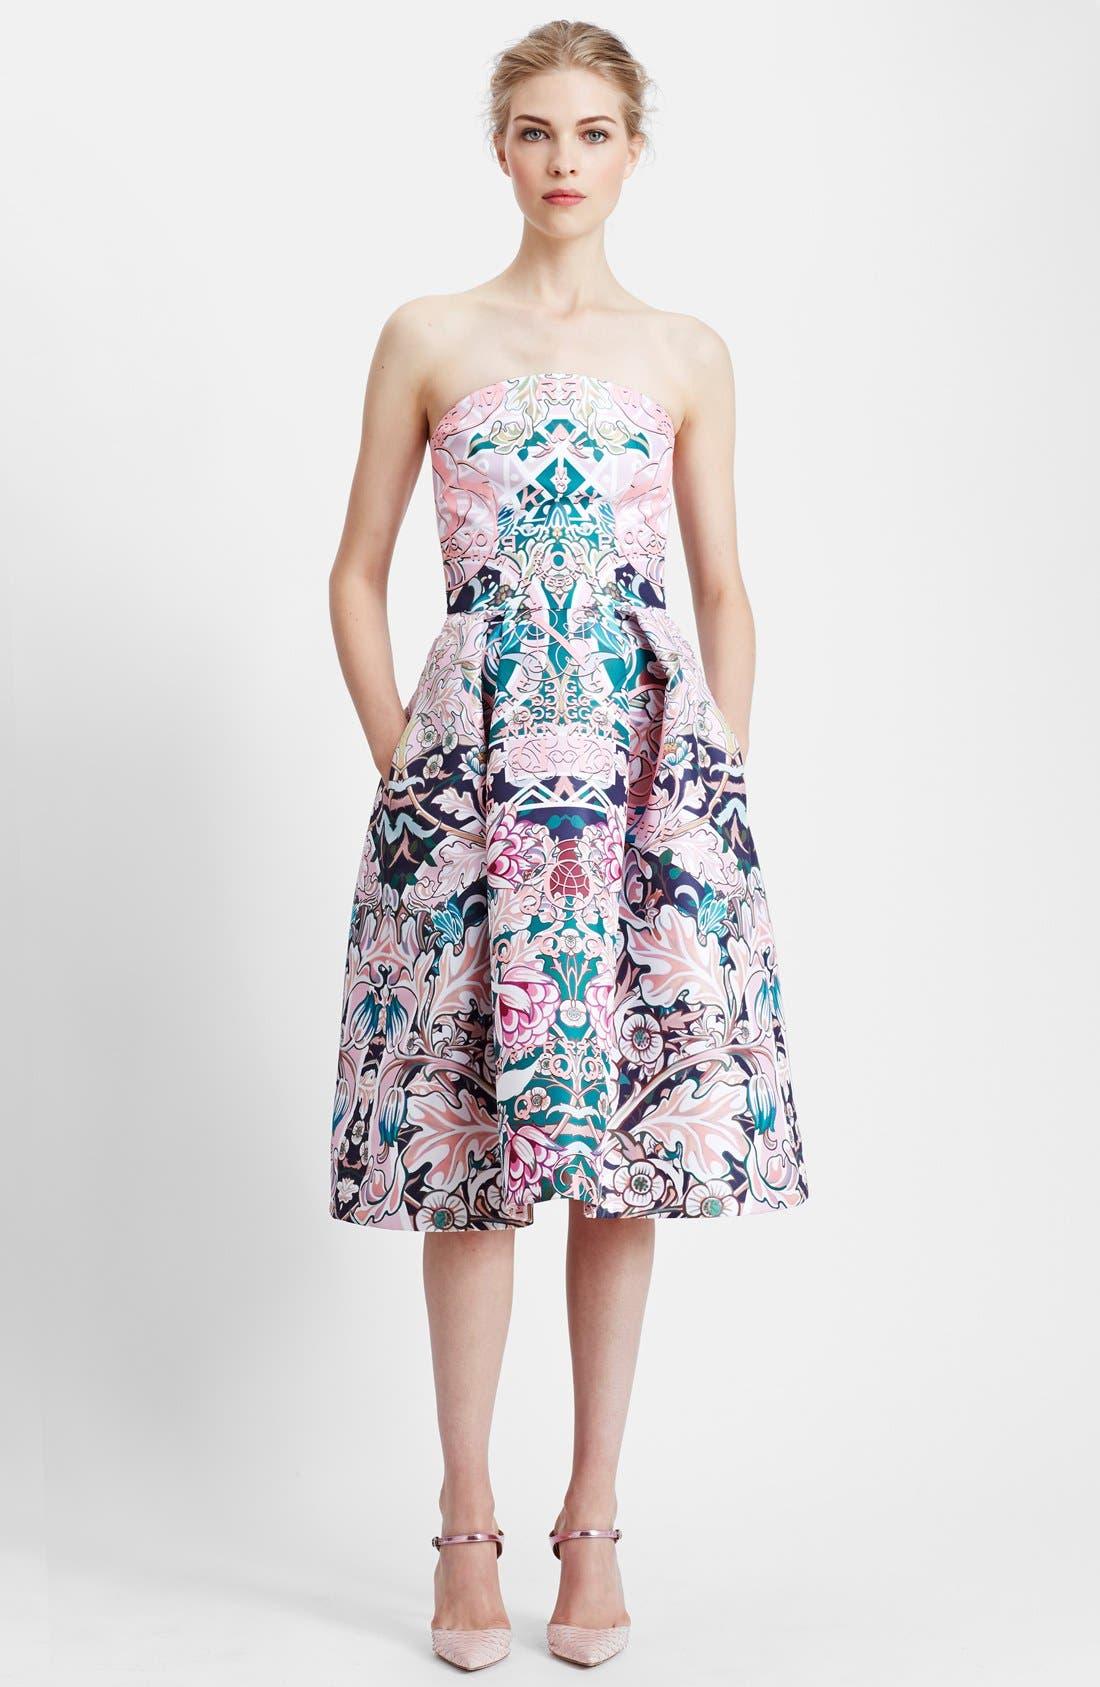 Main Image - Mary Katrantzou Print Strapless Fit & Flare Dress